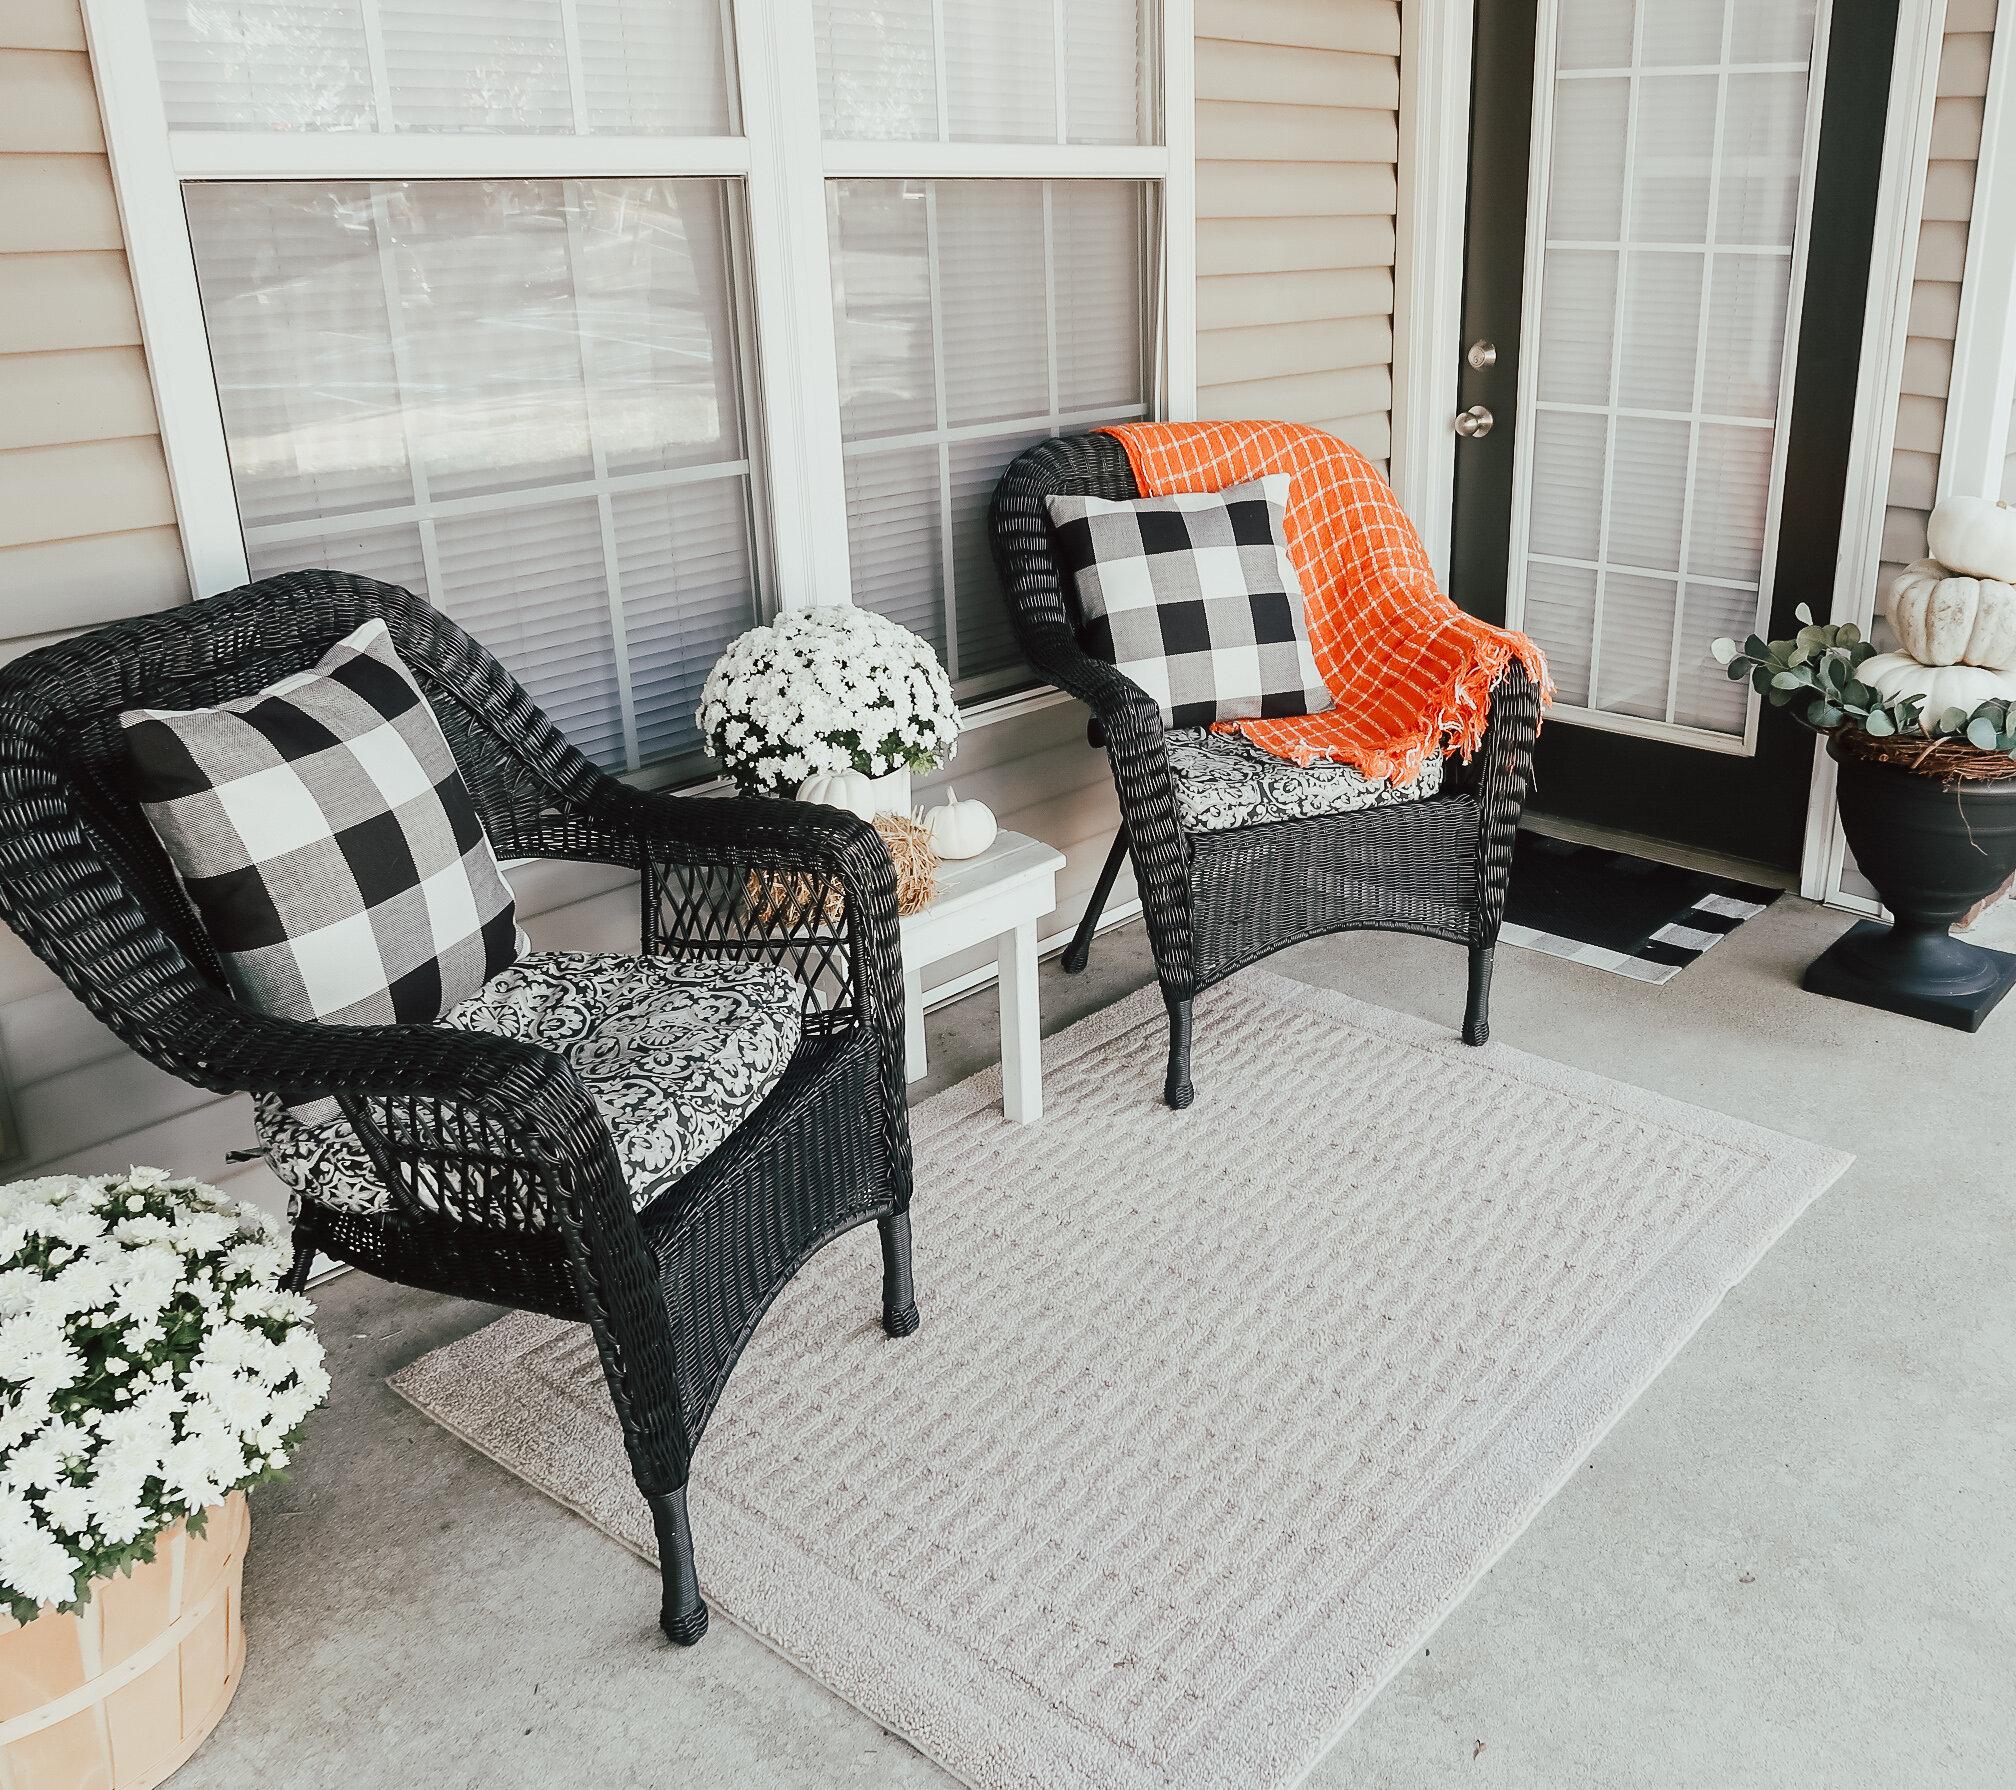 fall-front-porch-decor-1.jpg